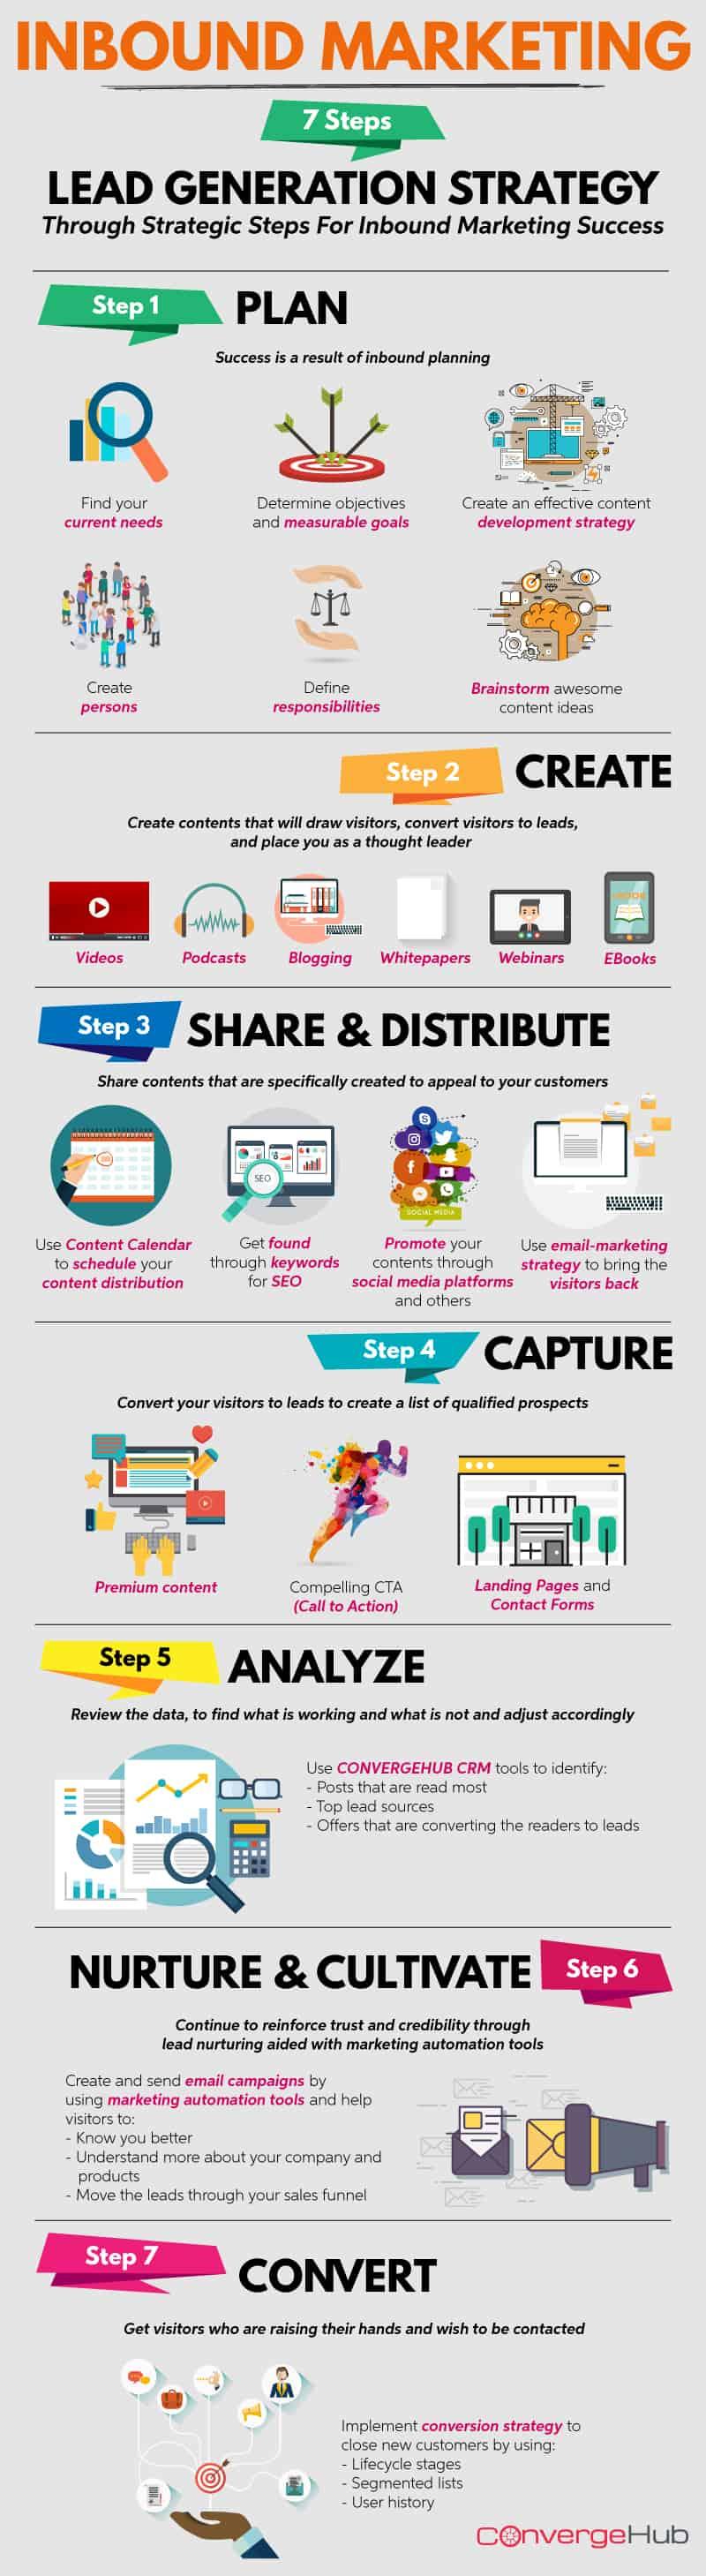 Lead Generation Through 7 Strategic Steps For Inbound Marketing Success